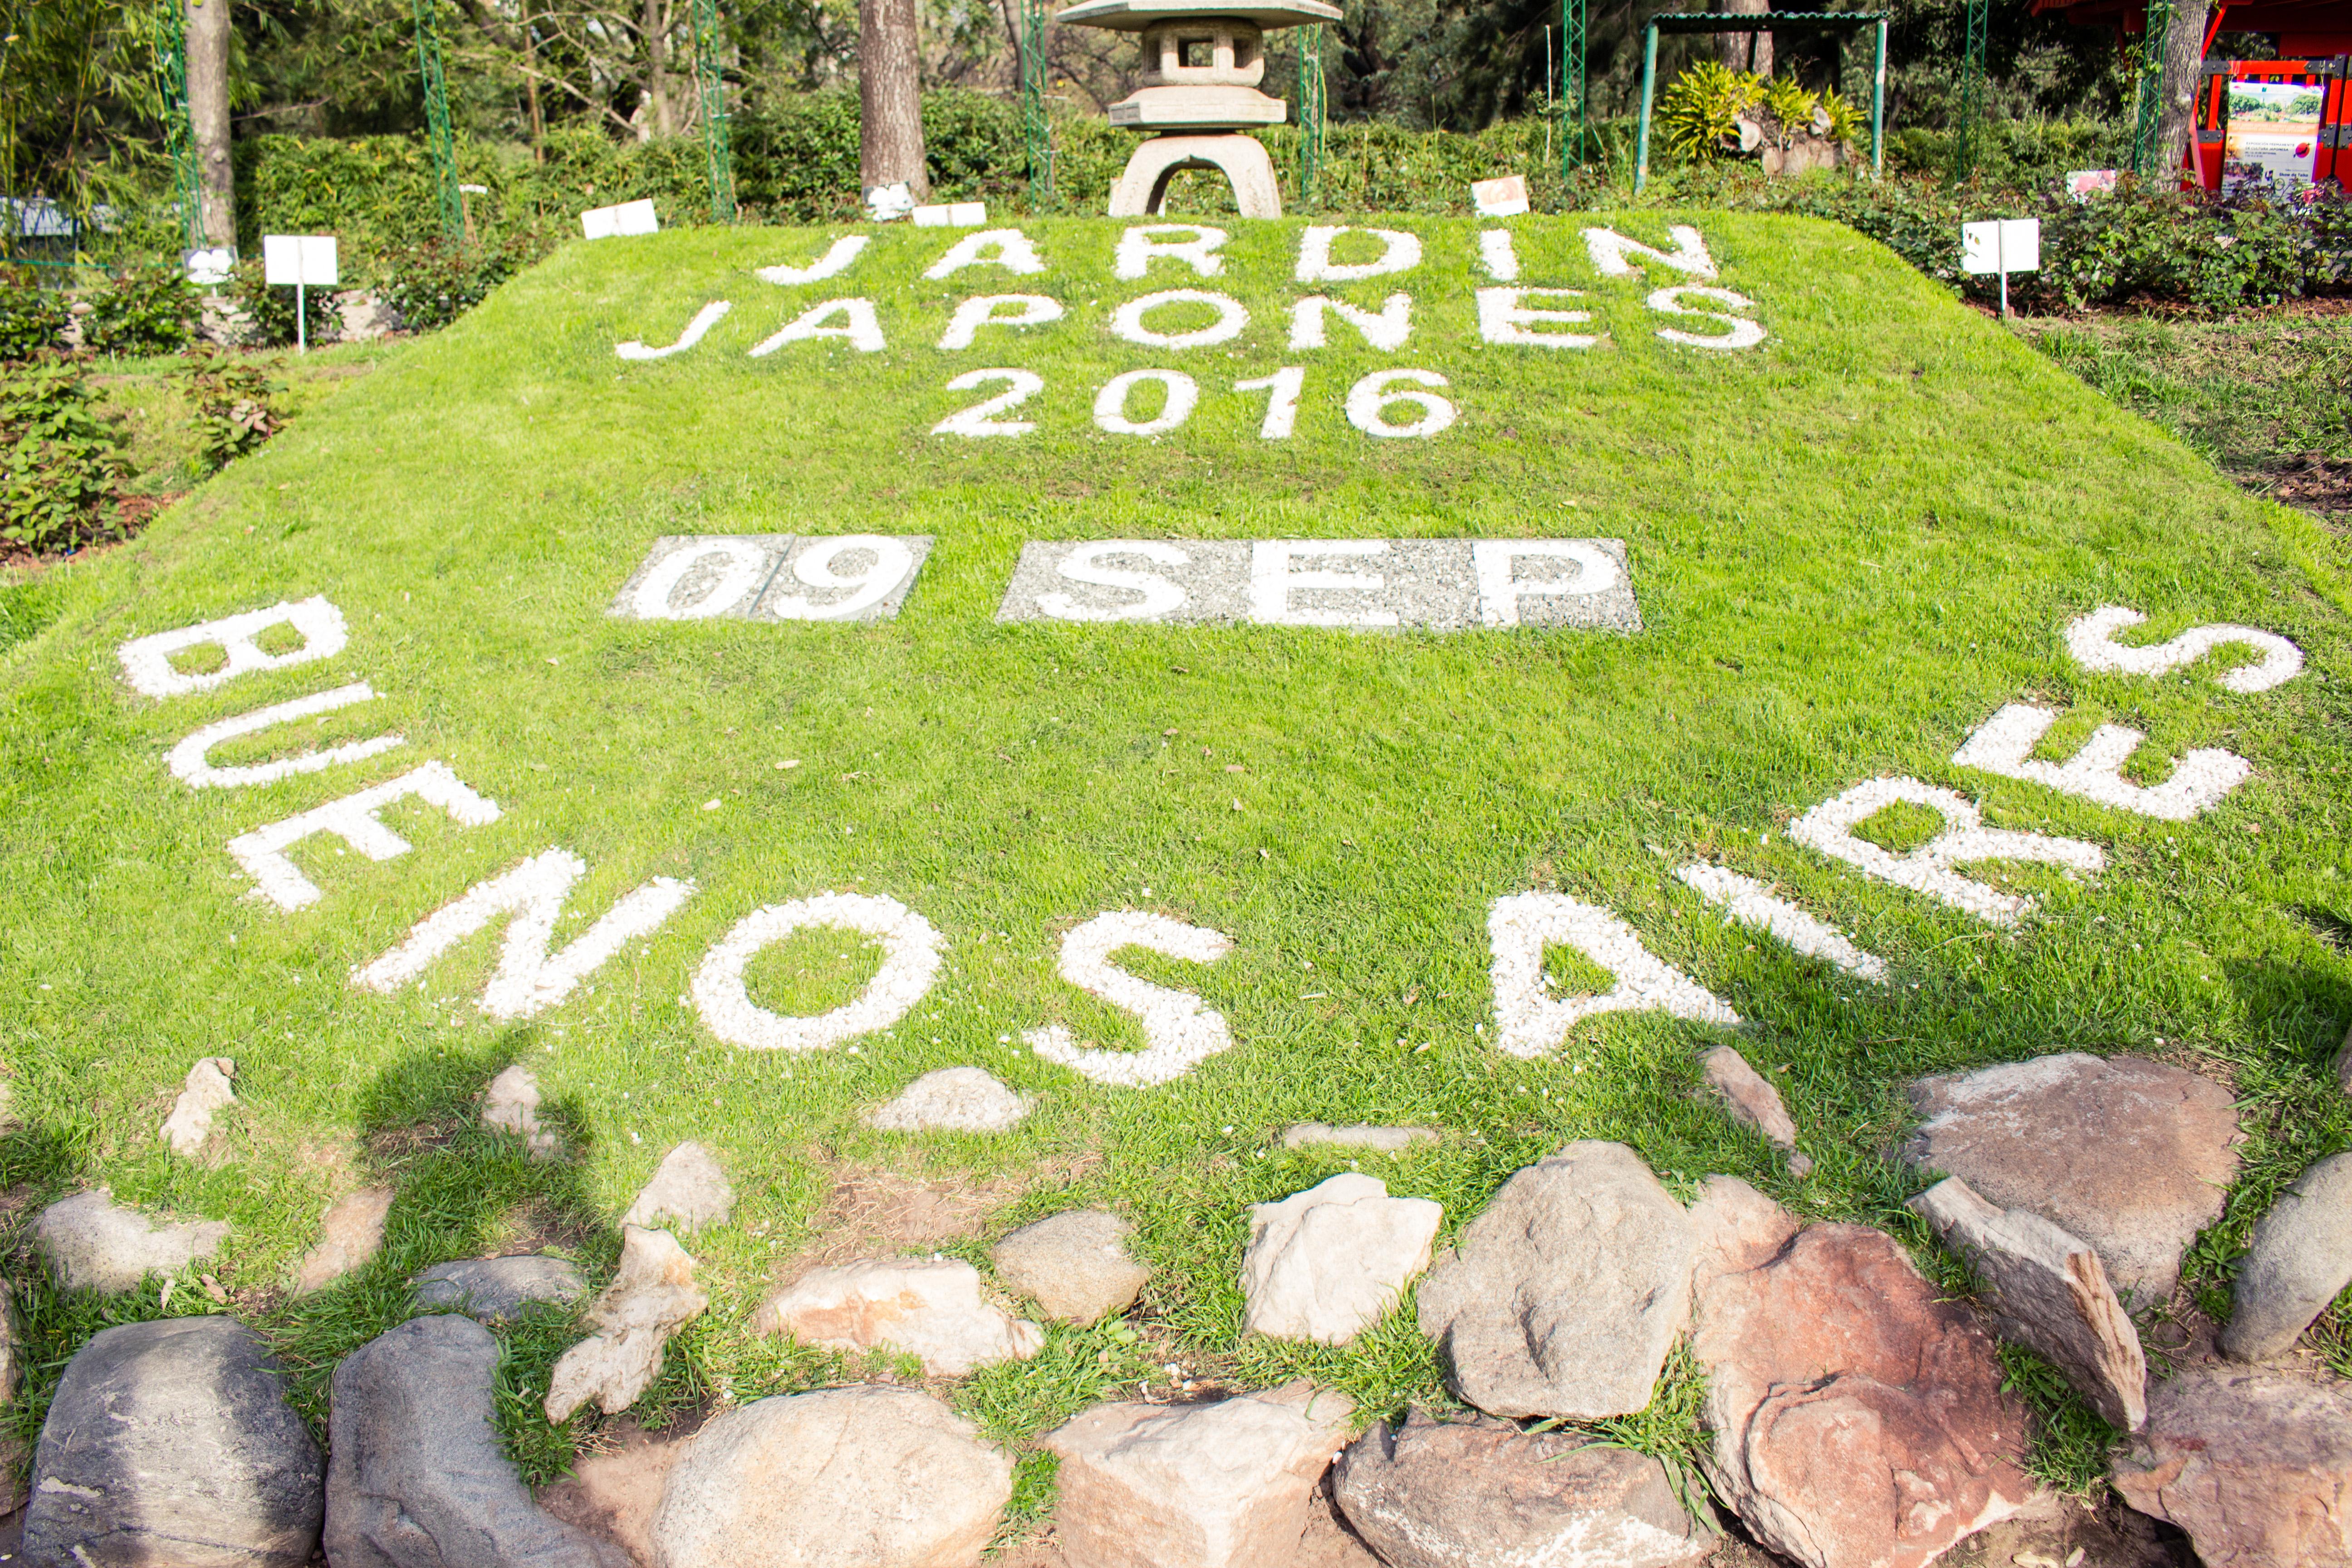 Conex odiario jard n japon s di rio aberto for Jardin japones precio 2016